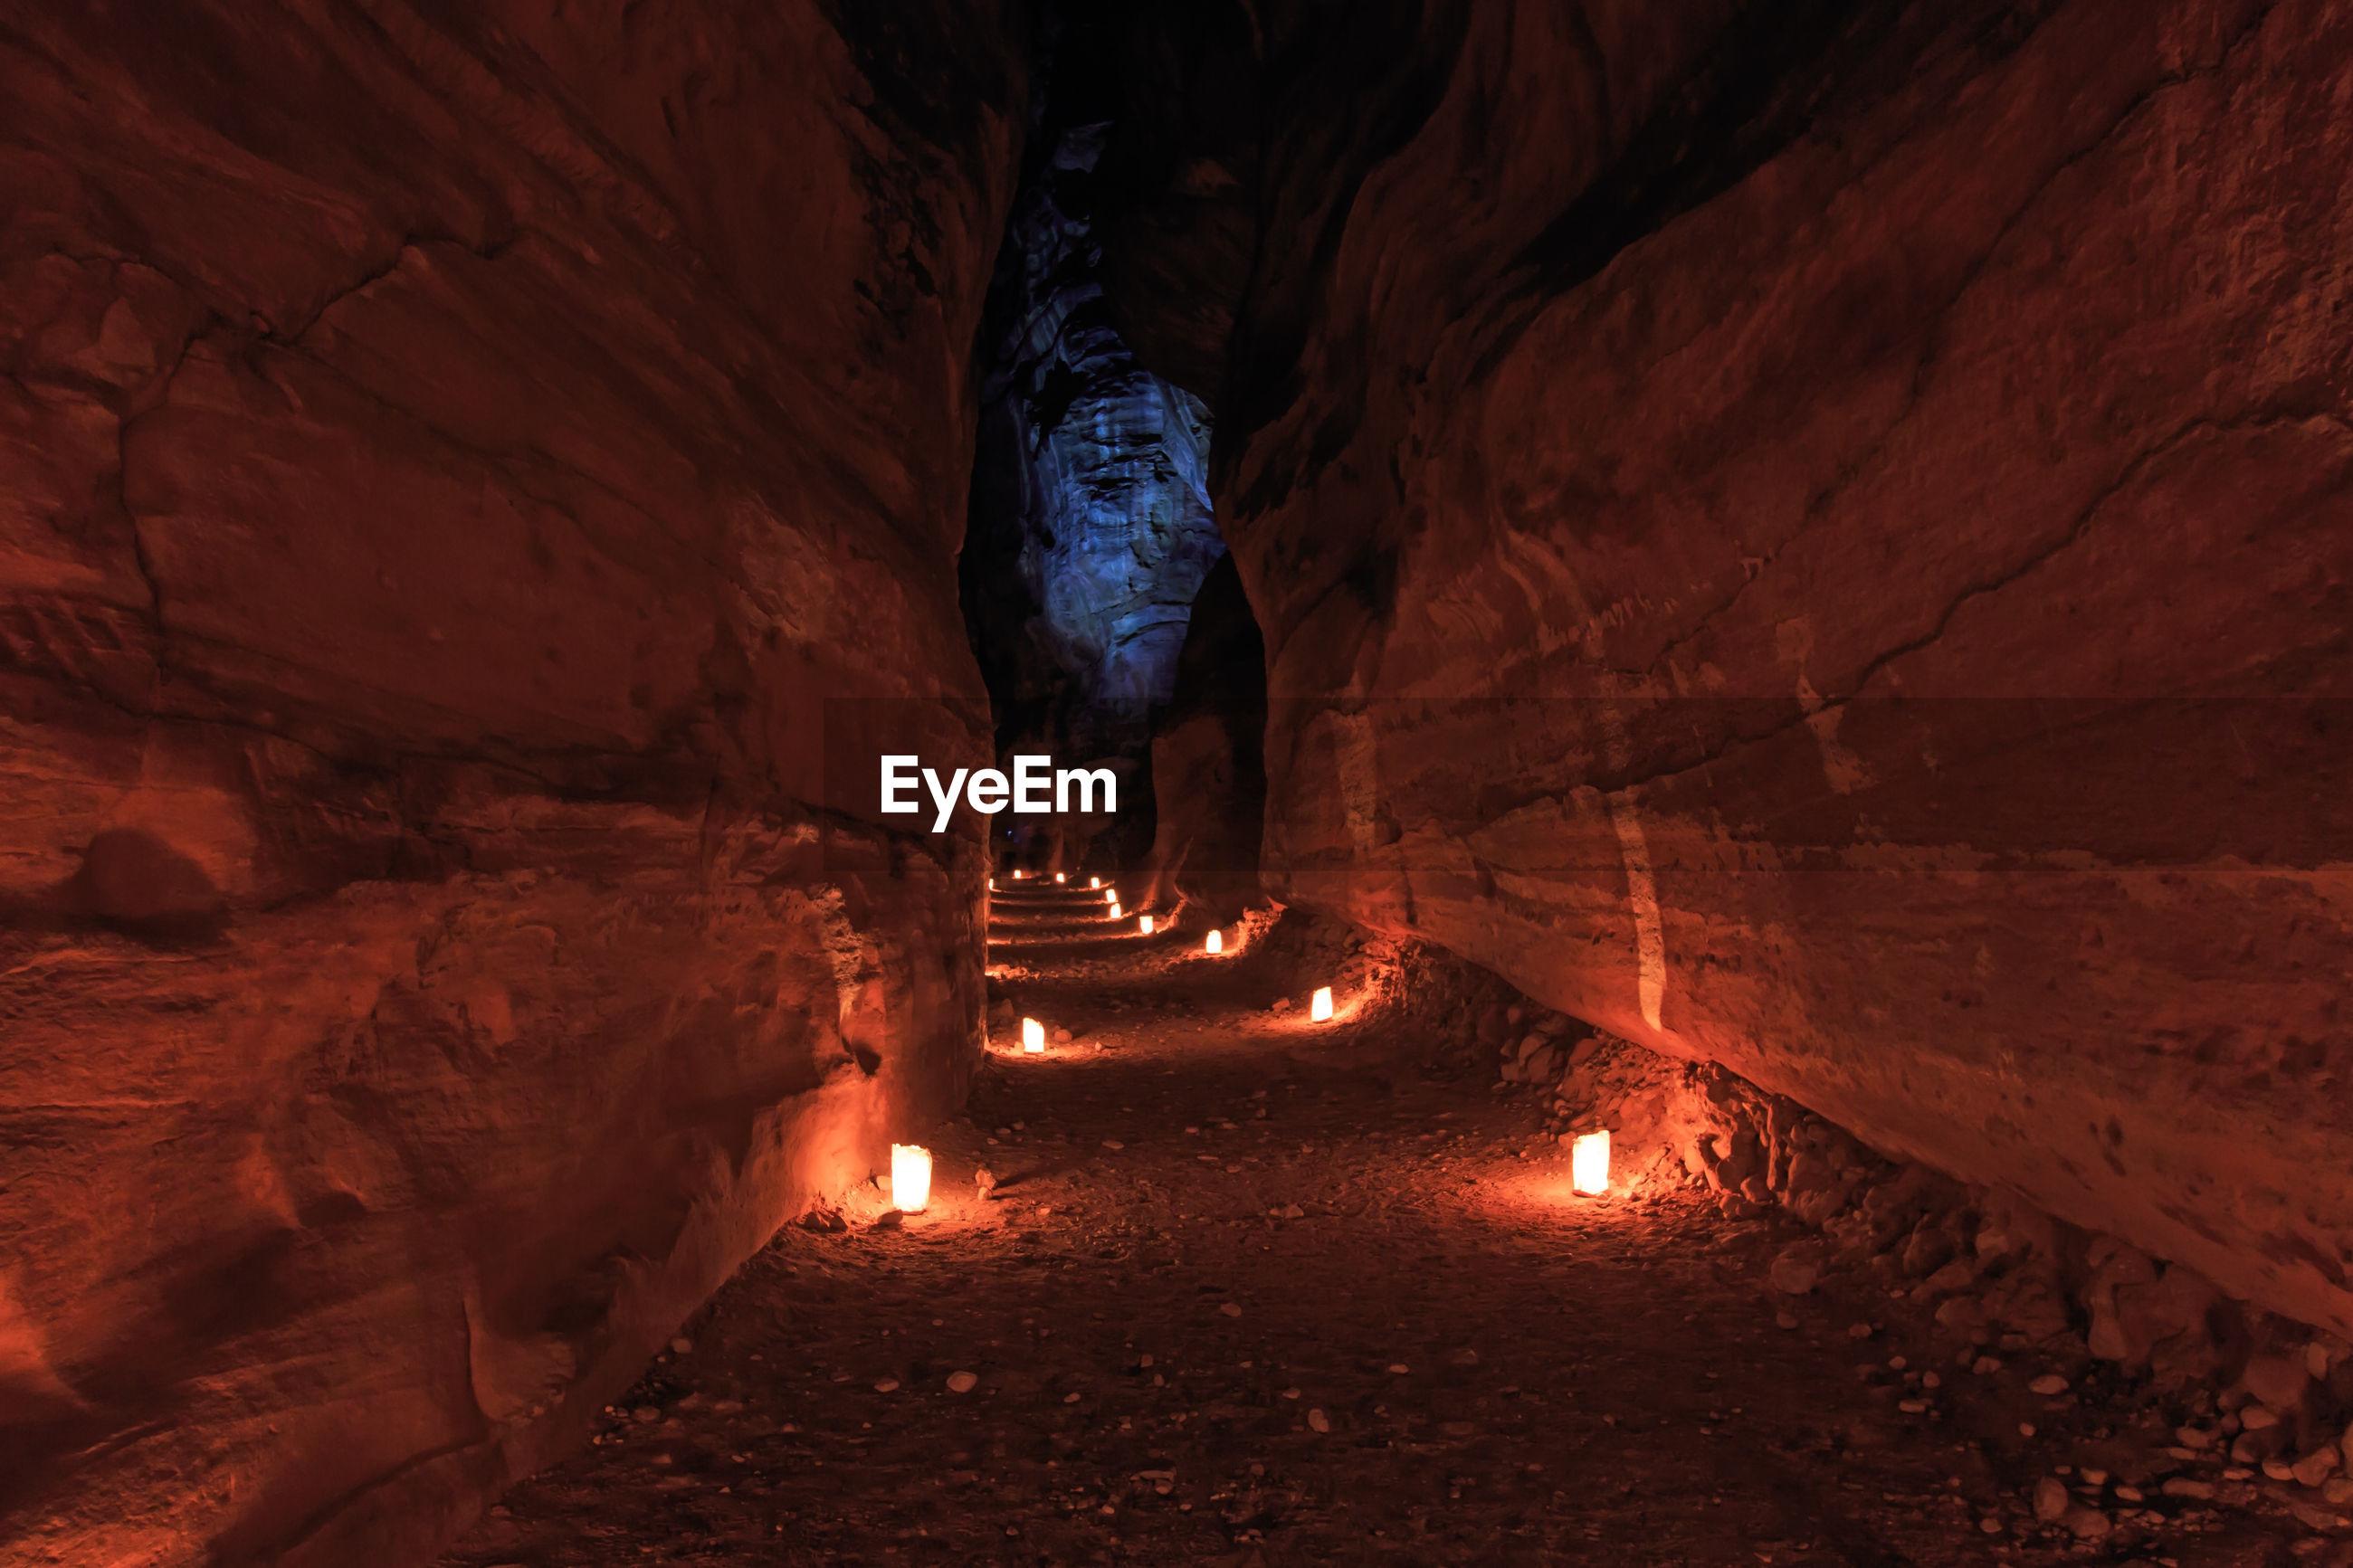 Illuminated lights in cave